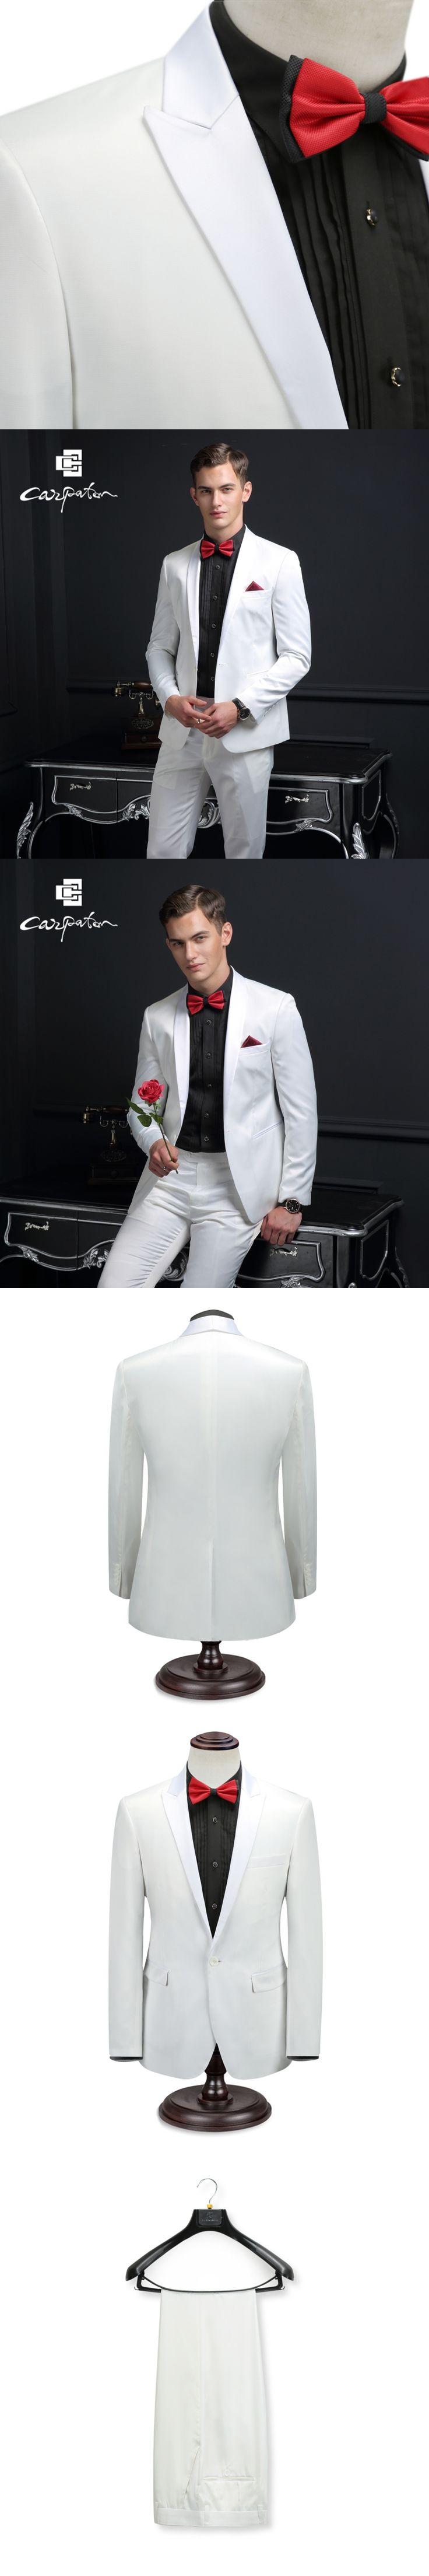 Carpaton Men Suit White Wool Designer 3PCS Suit Shawl Collar Brand Skinny Tuxedo Large Size Grooms Wedding Suits For Men Host